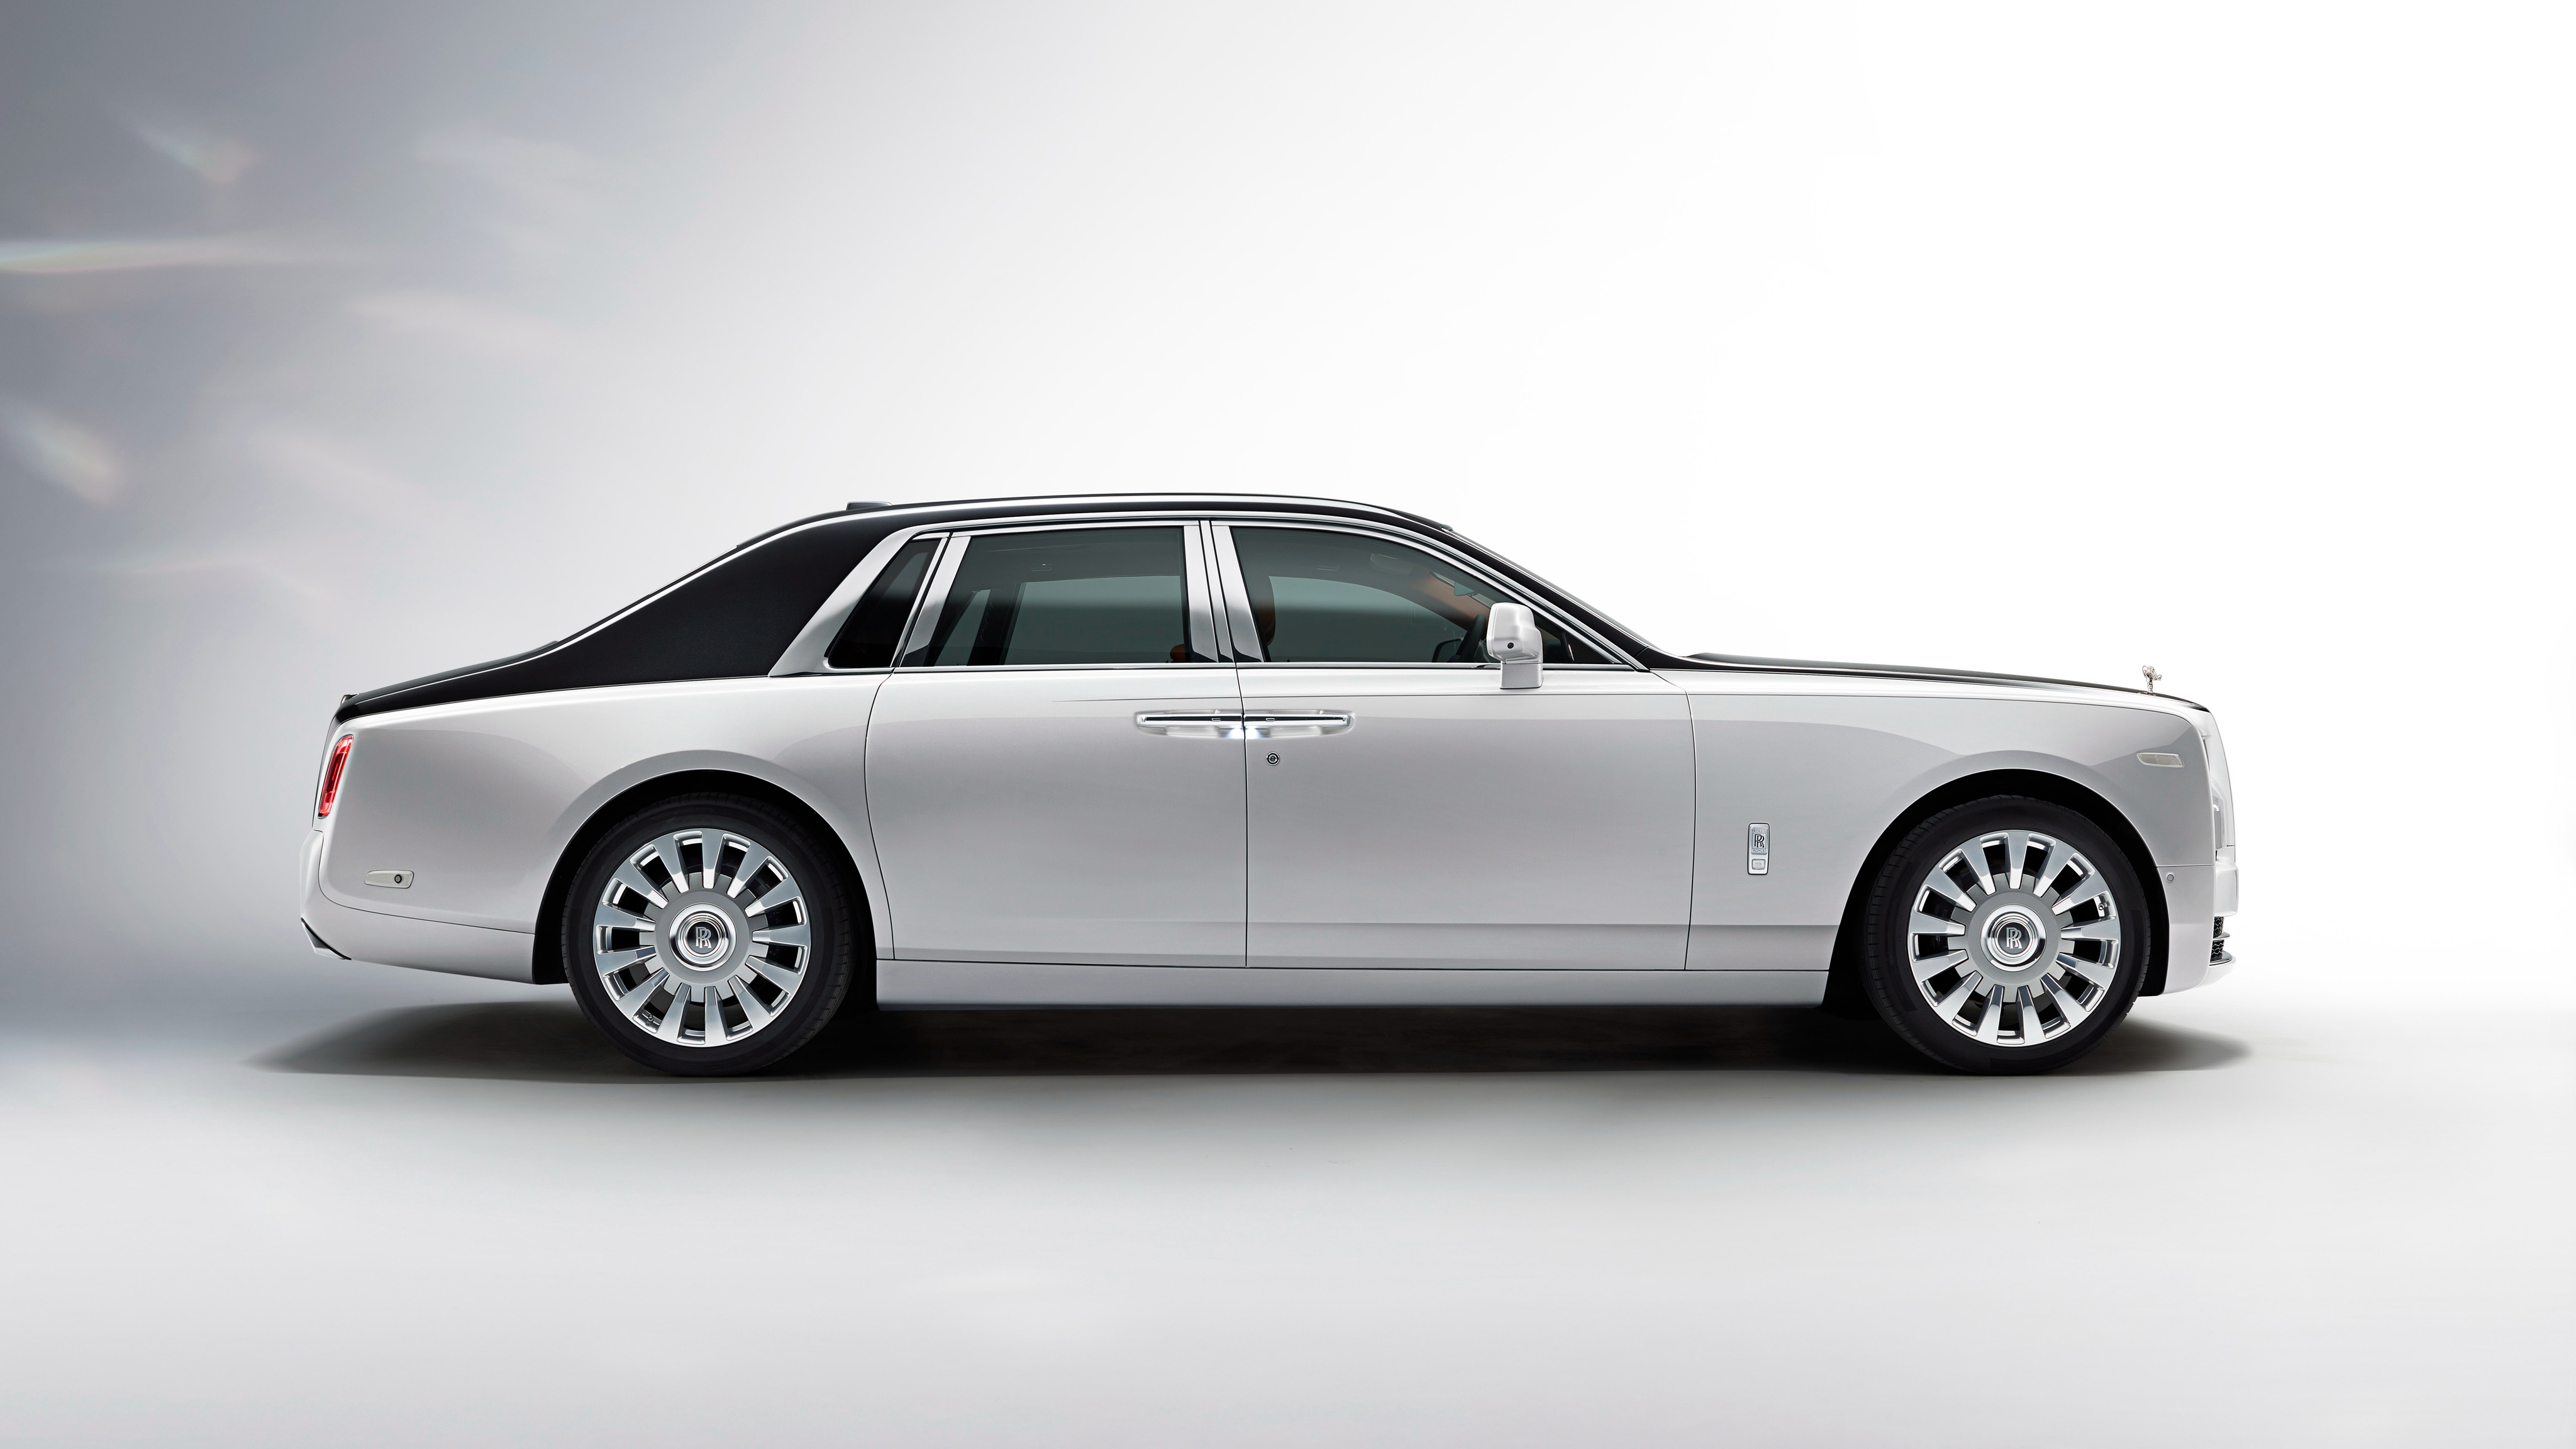 2017 Rolls Royce Phantom 2 Wallpaper Hd Car Wallpapers Id 8139